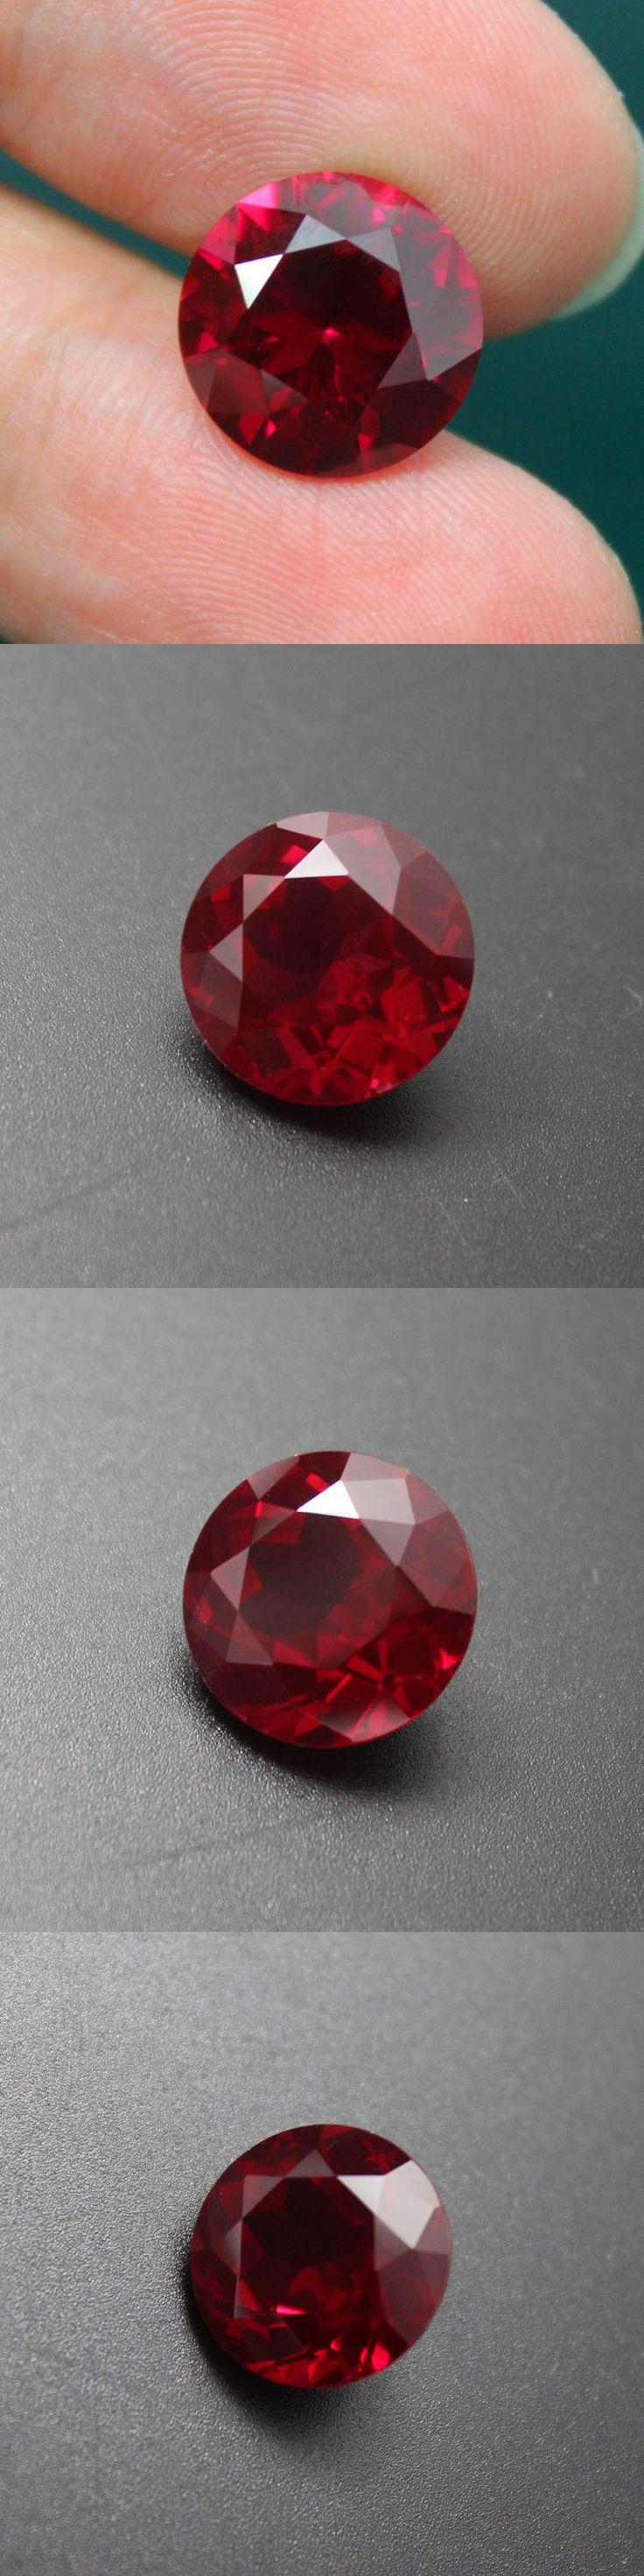 Lab-Created Rubies 122957: 10Mm Round Circular Ruby Diamond Gemstone Barestone Red Ring Maried Wedding Gem BUY IT NOW ONLY: $41.99